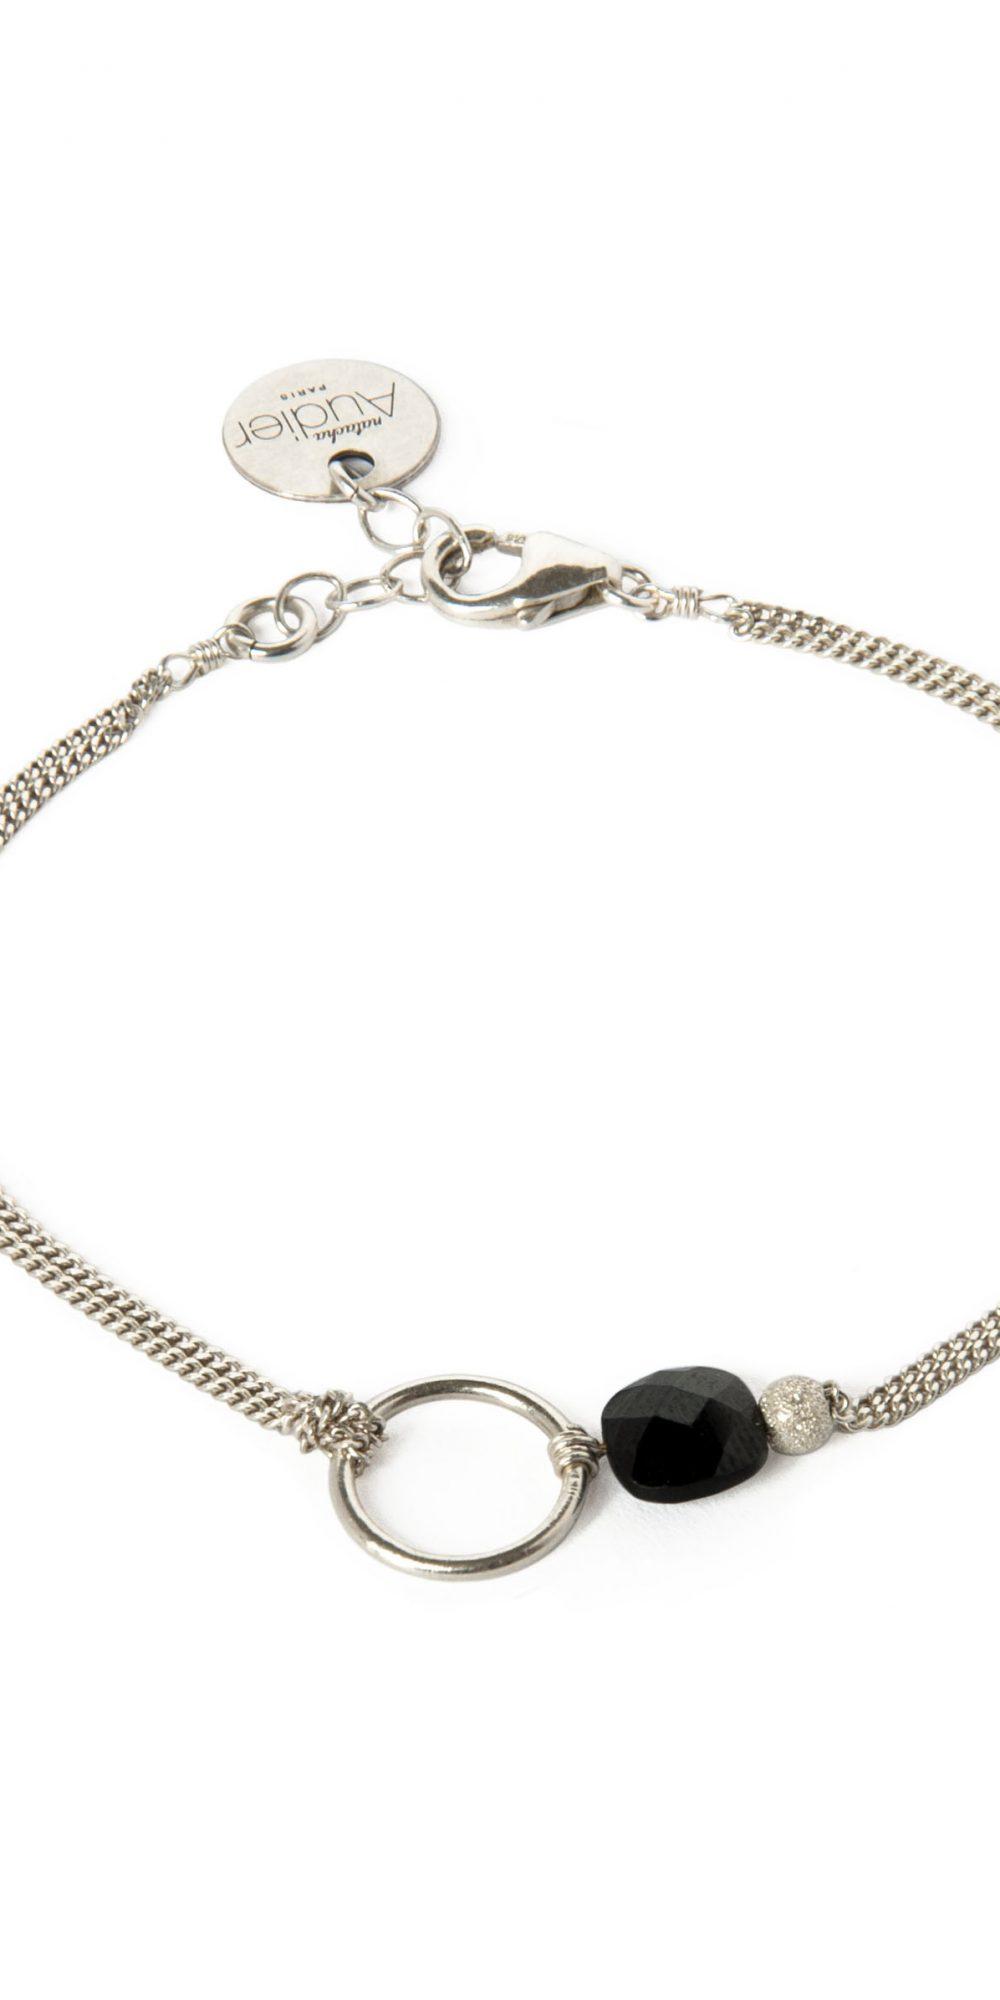 bracelet onyx noir et argent massif my precious natacha. Black Bedroom Furniture Sets. Home Design Ideas